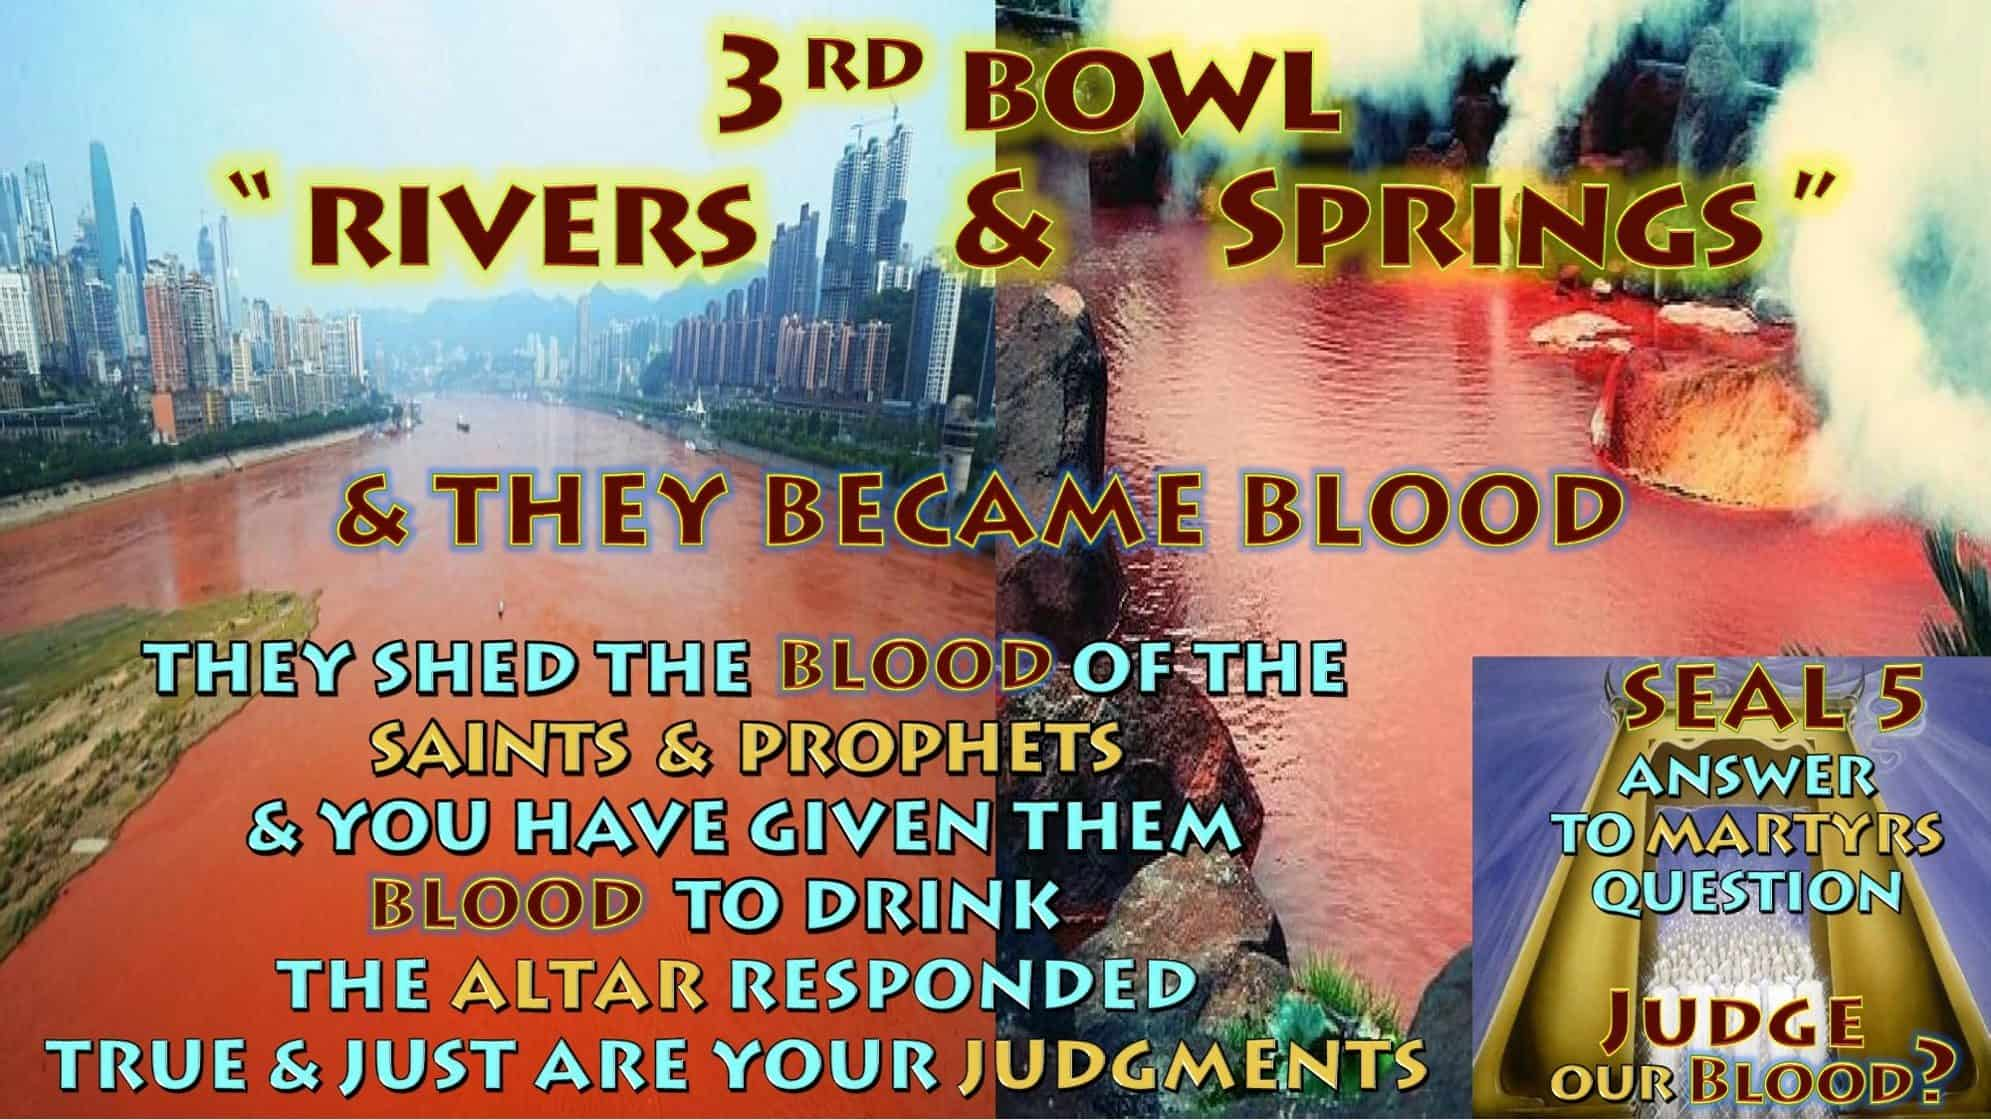 Third Vial,Bowl of Wrath,Rivers,Springs,Blood,Drink,Altar,Just,Juggments,Seven,Vials,Bowls of Wrath,Book of Revelation